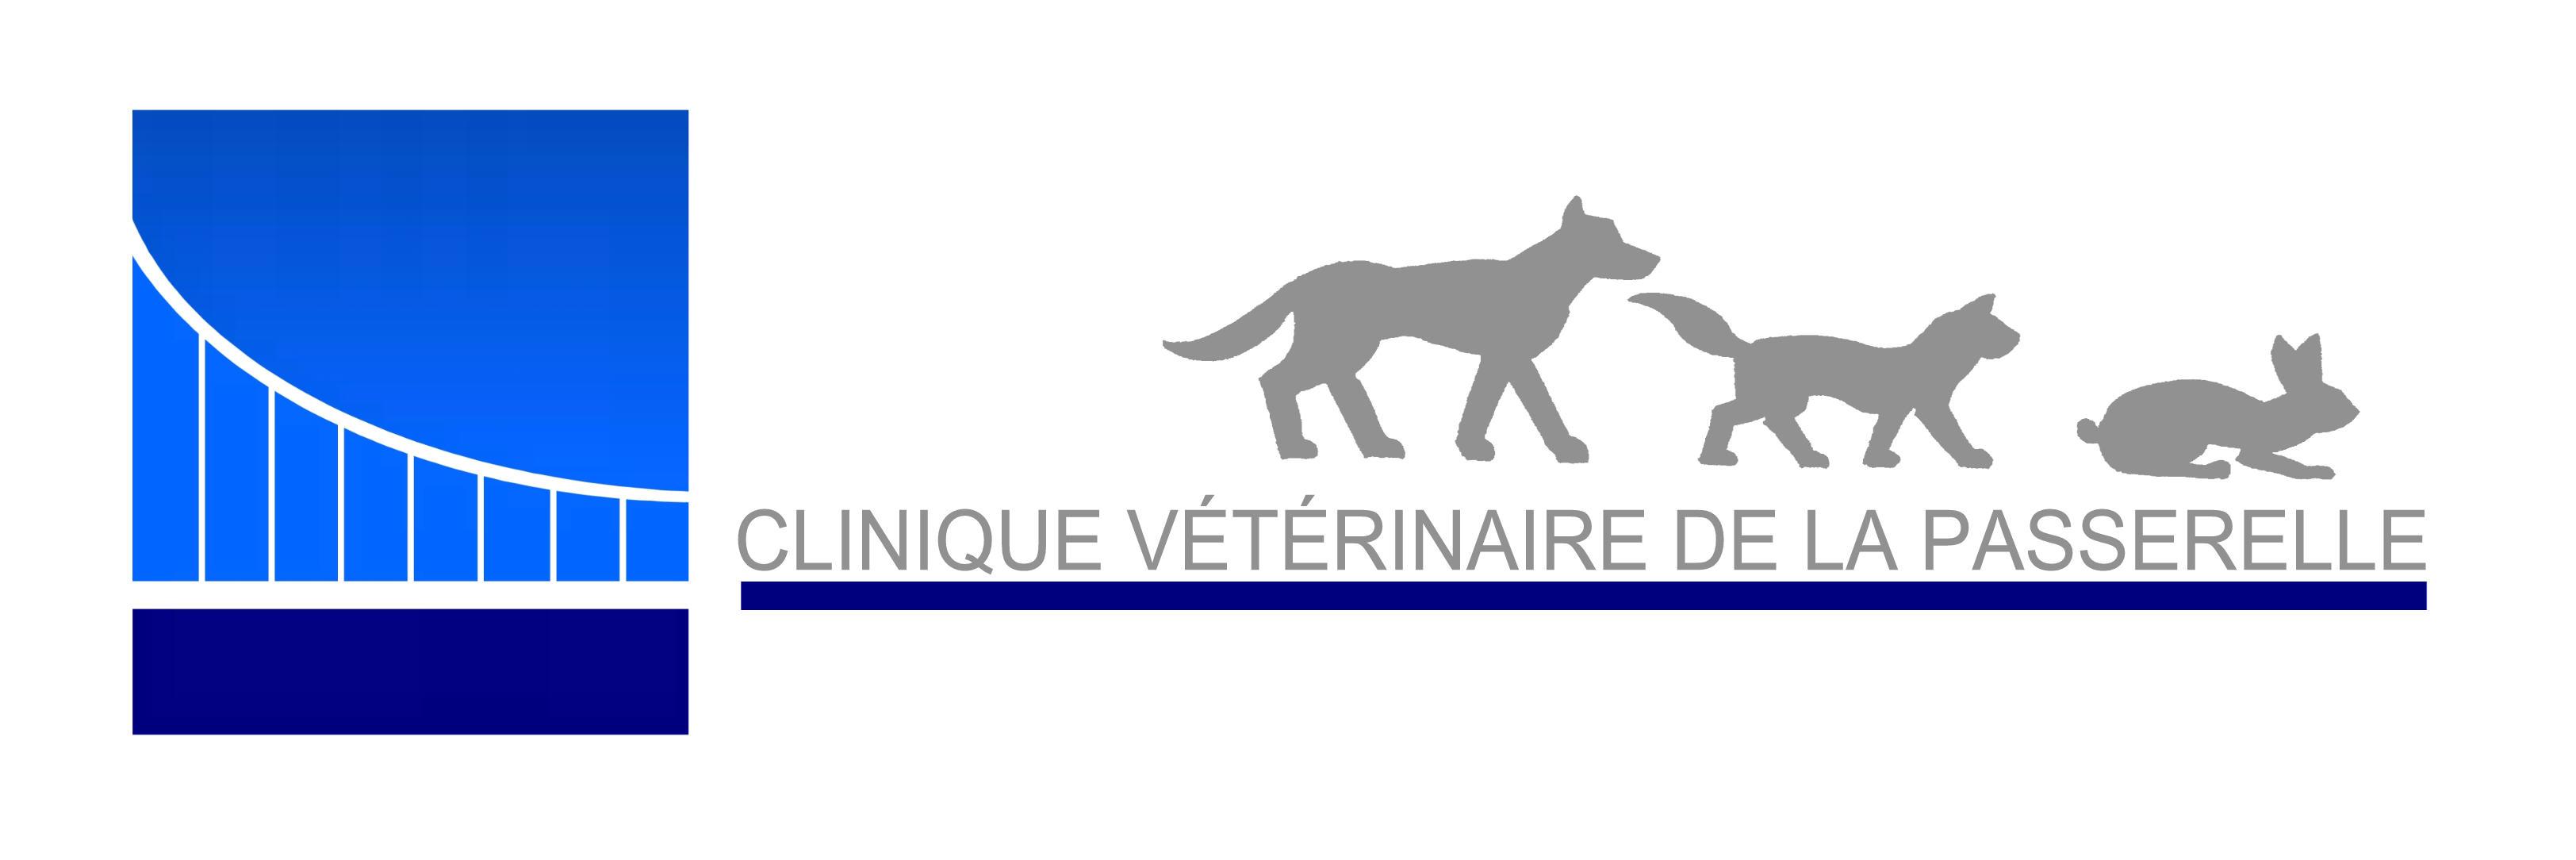 clinique passerelle veterinaire givors grigny chasse rhone véto